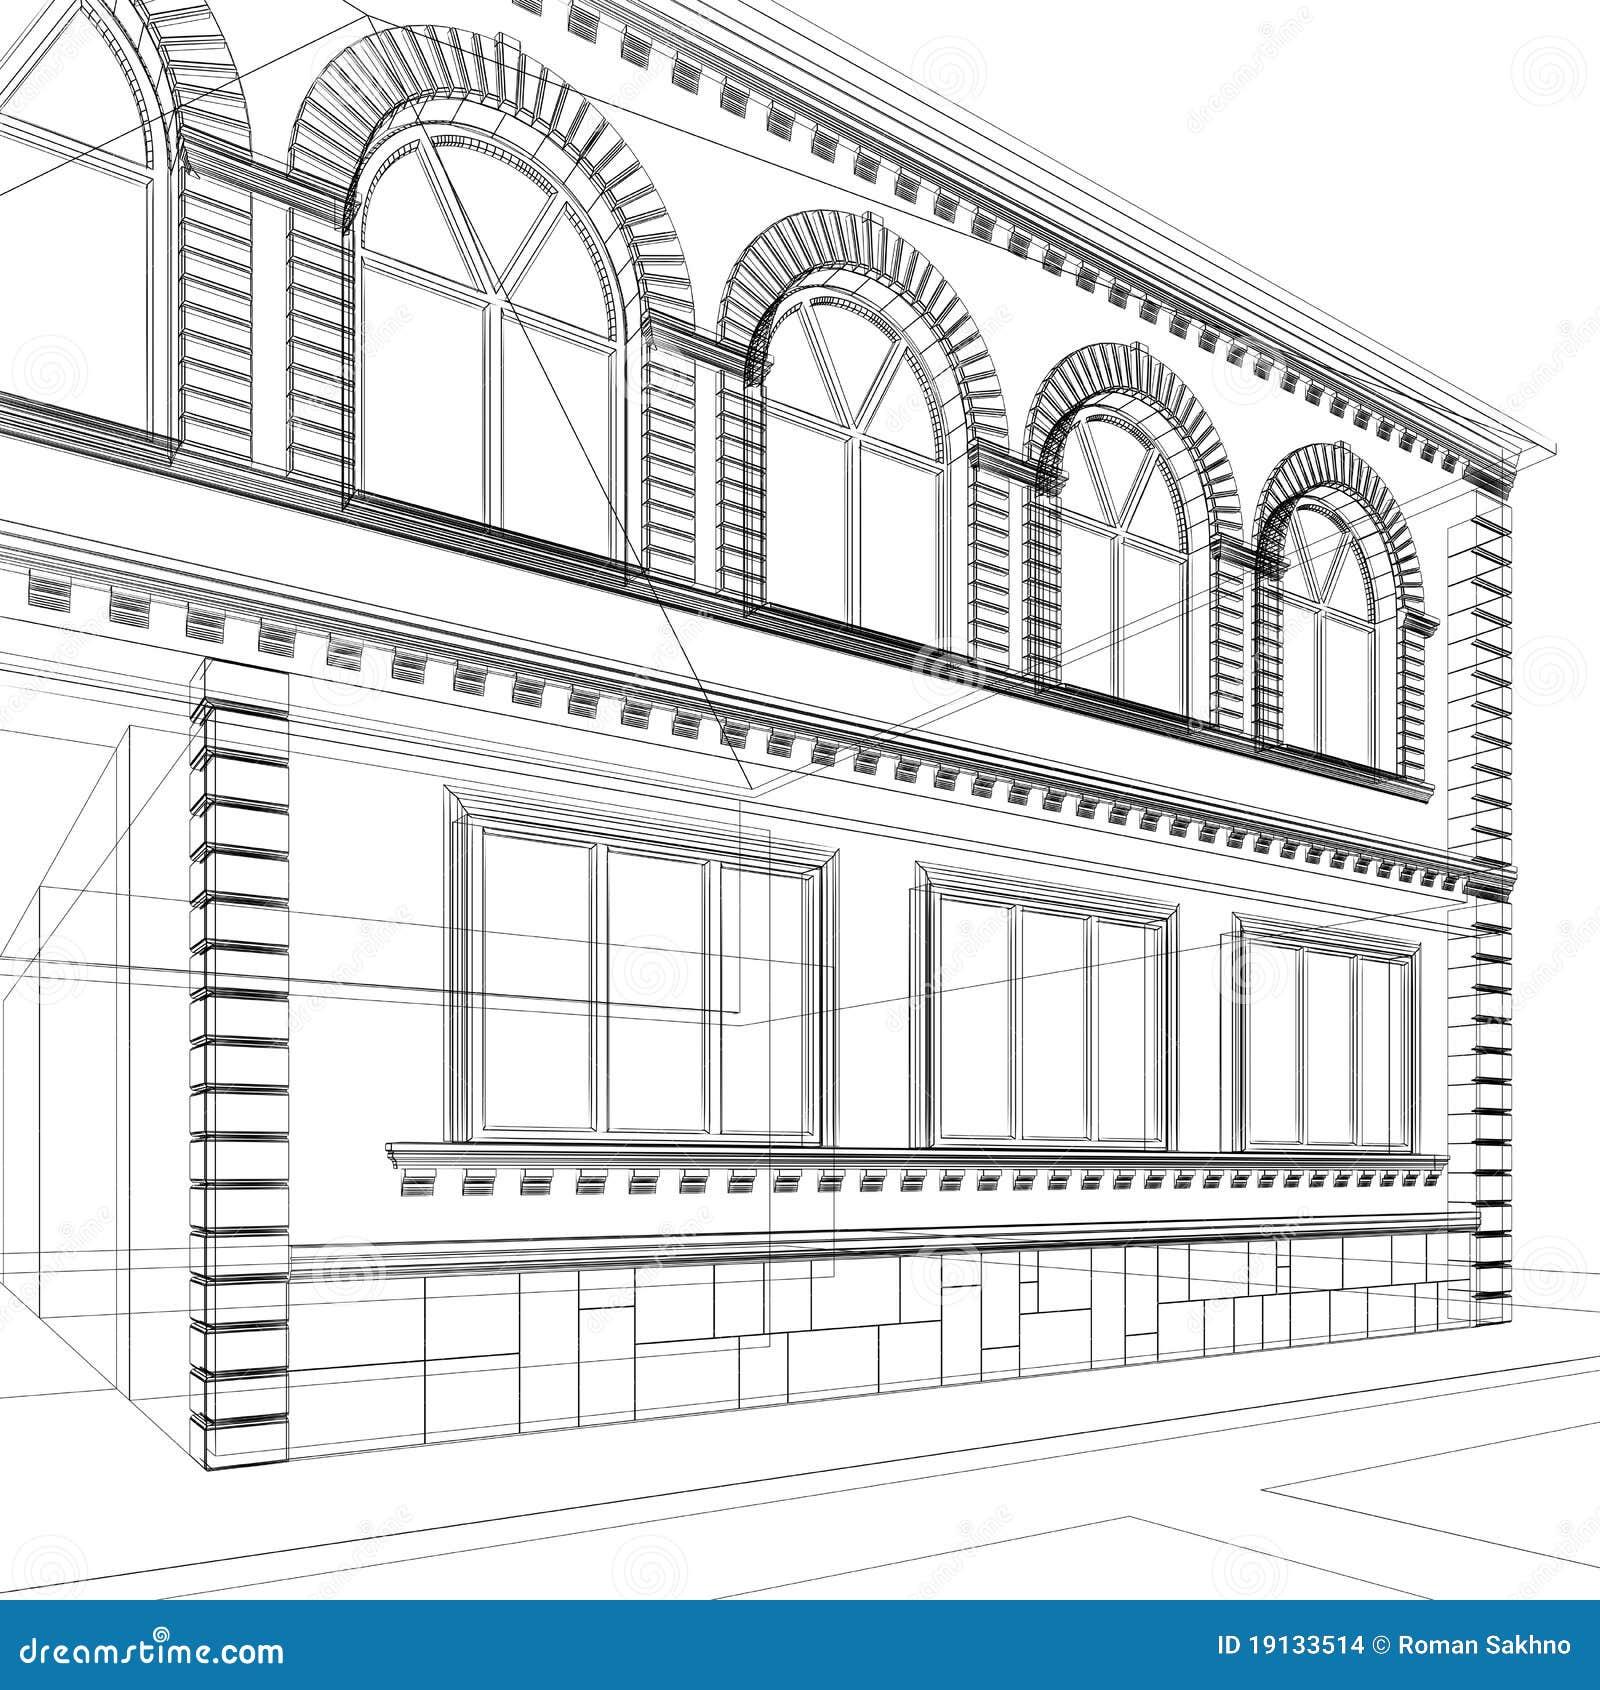 Croquis abstrait architectural